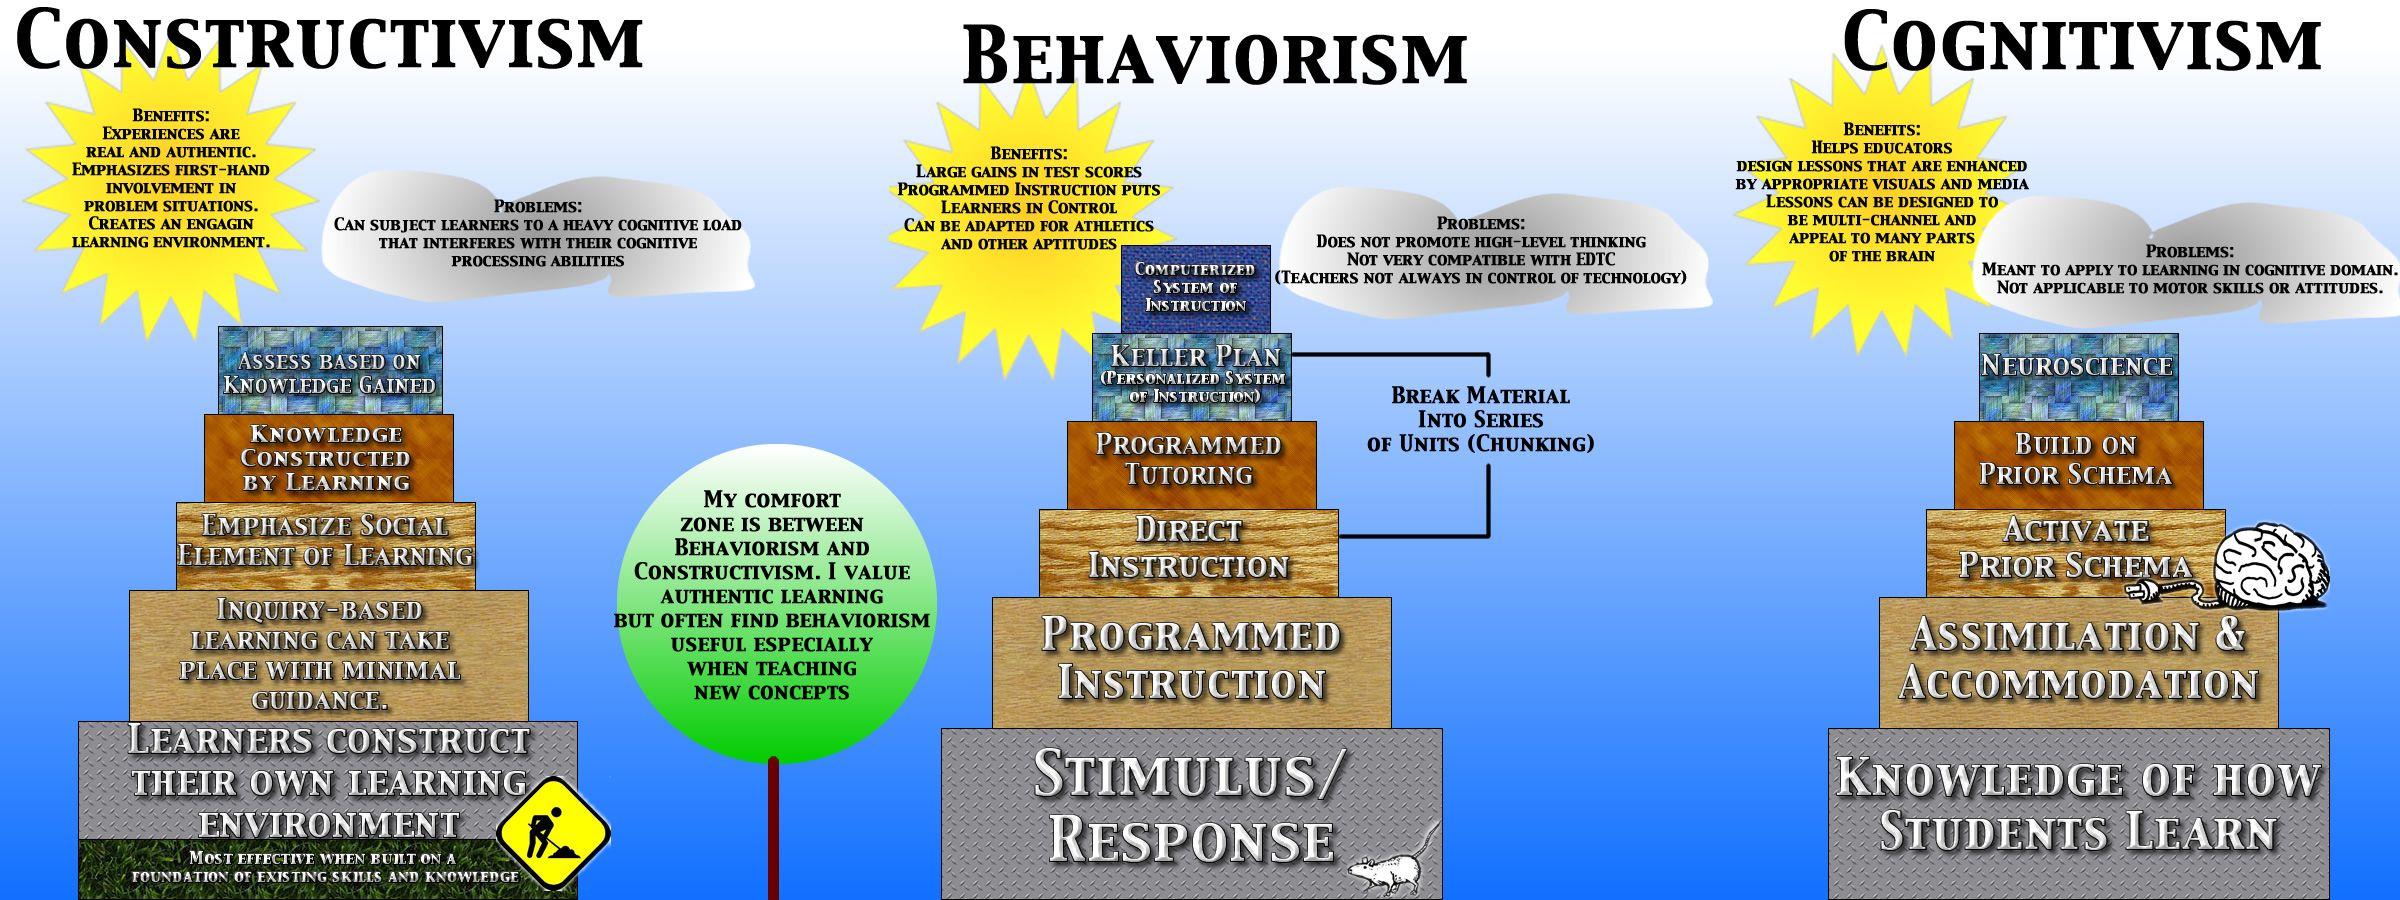 Learning Theories Constructivism Behaviorism